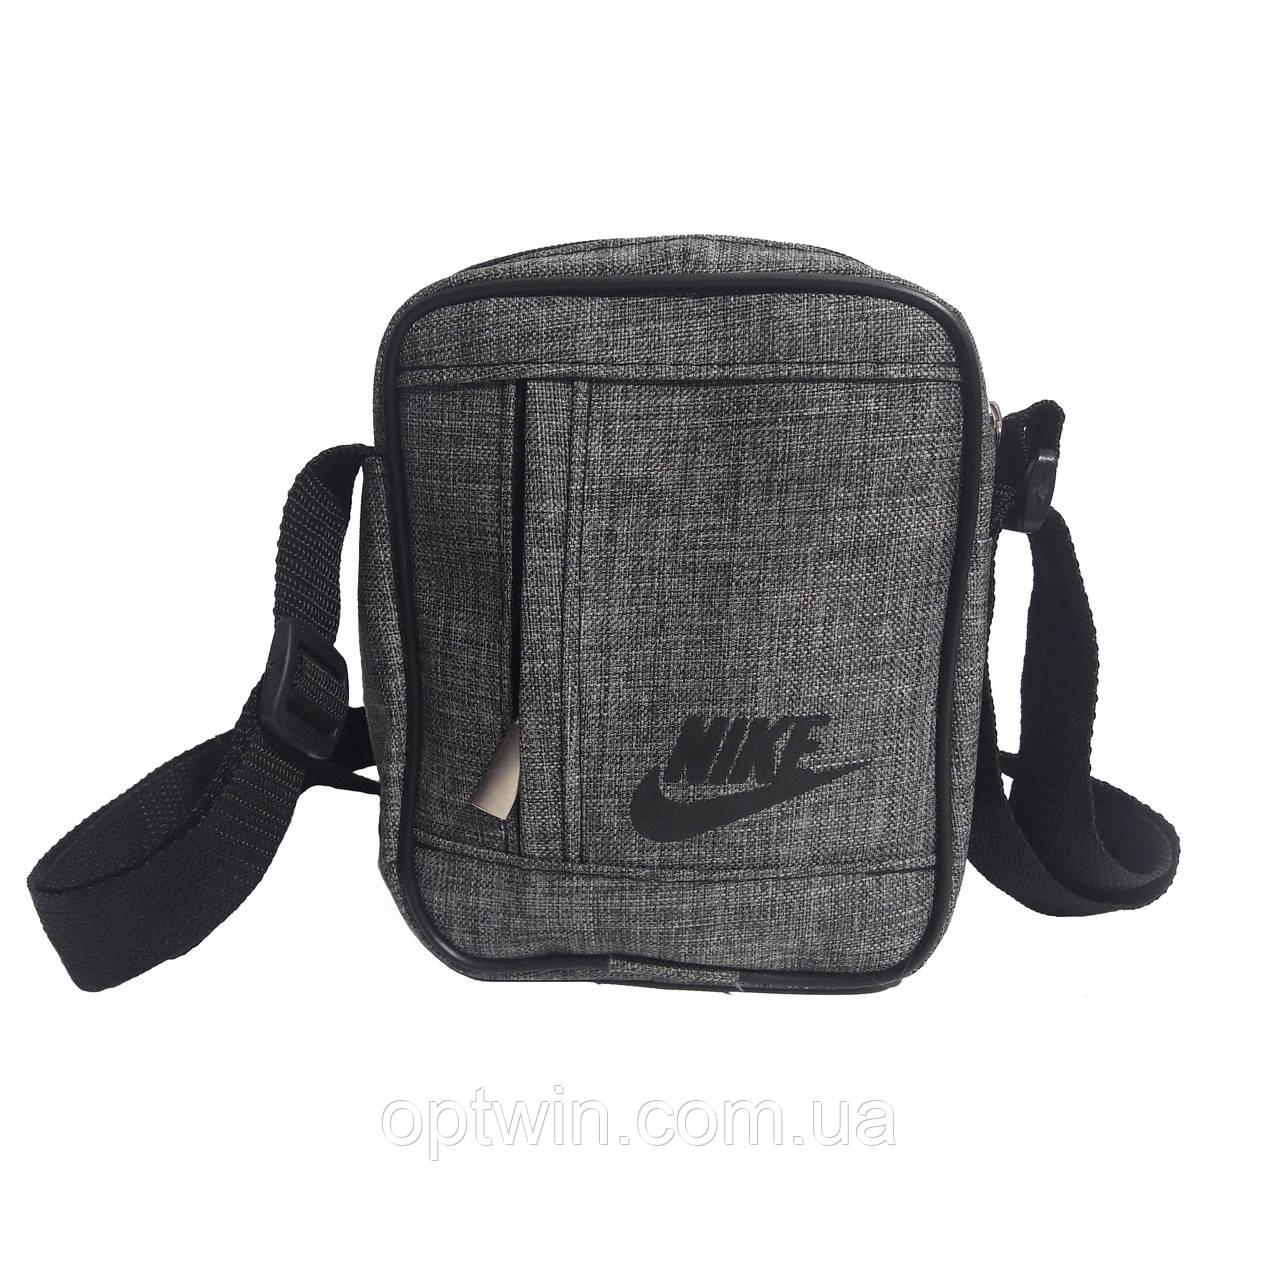 Сумка на плечо, барсетка Nike серая, на 3 отделения (реплика), фото 1